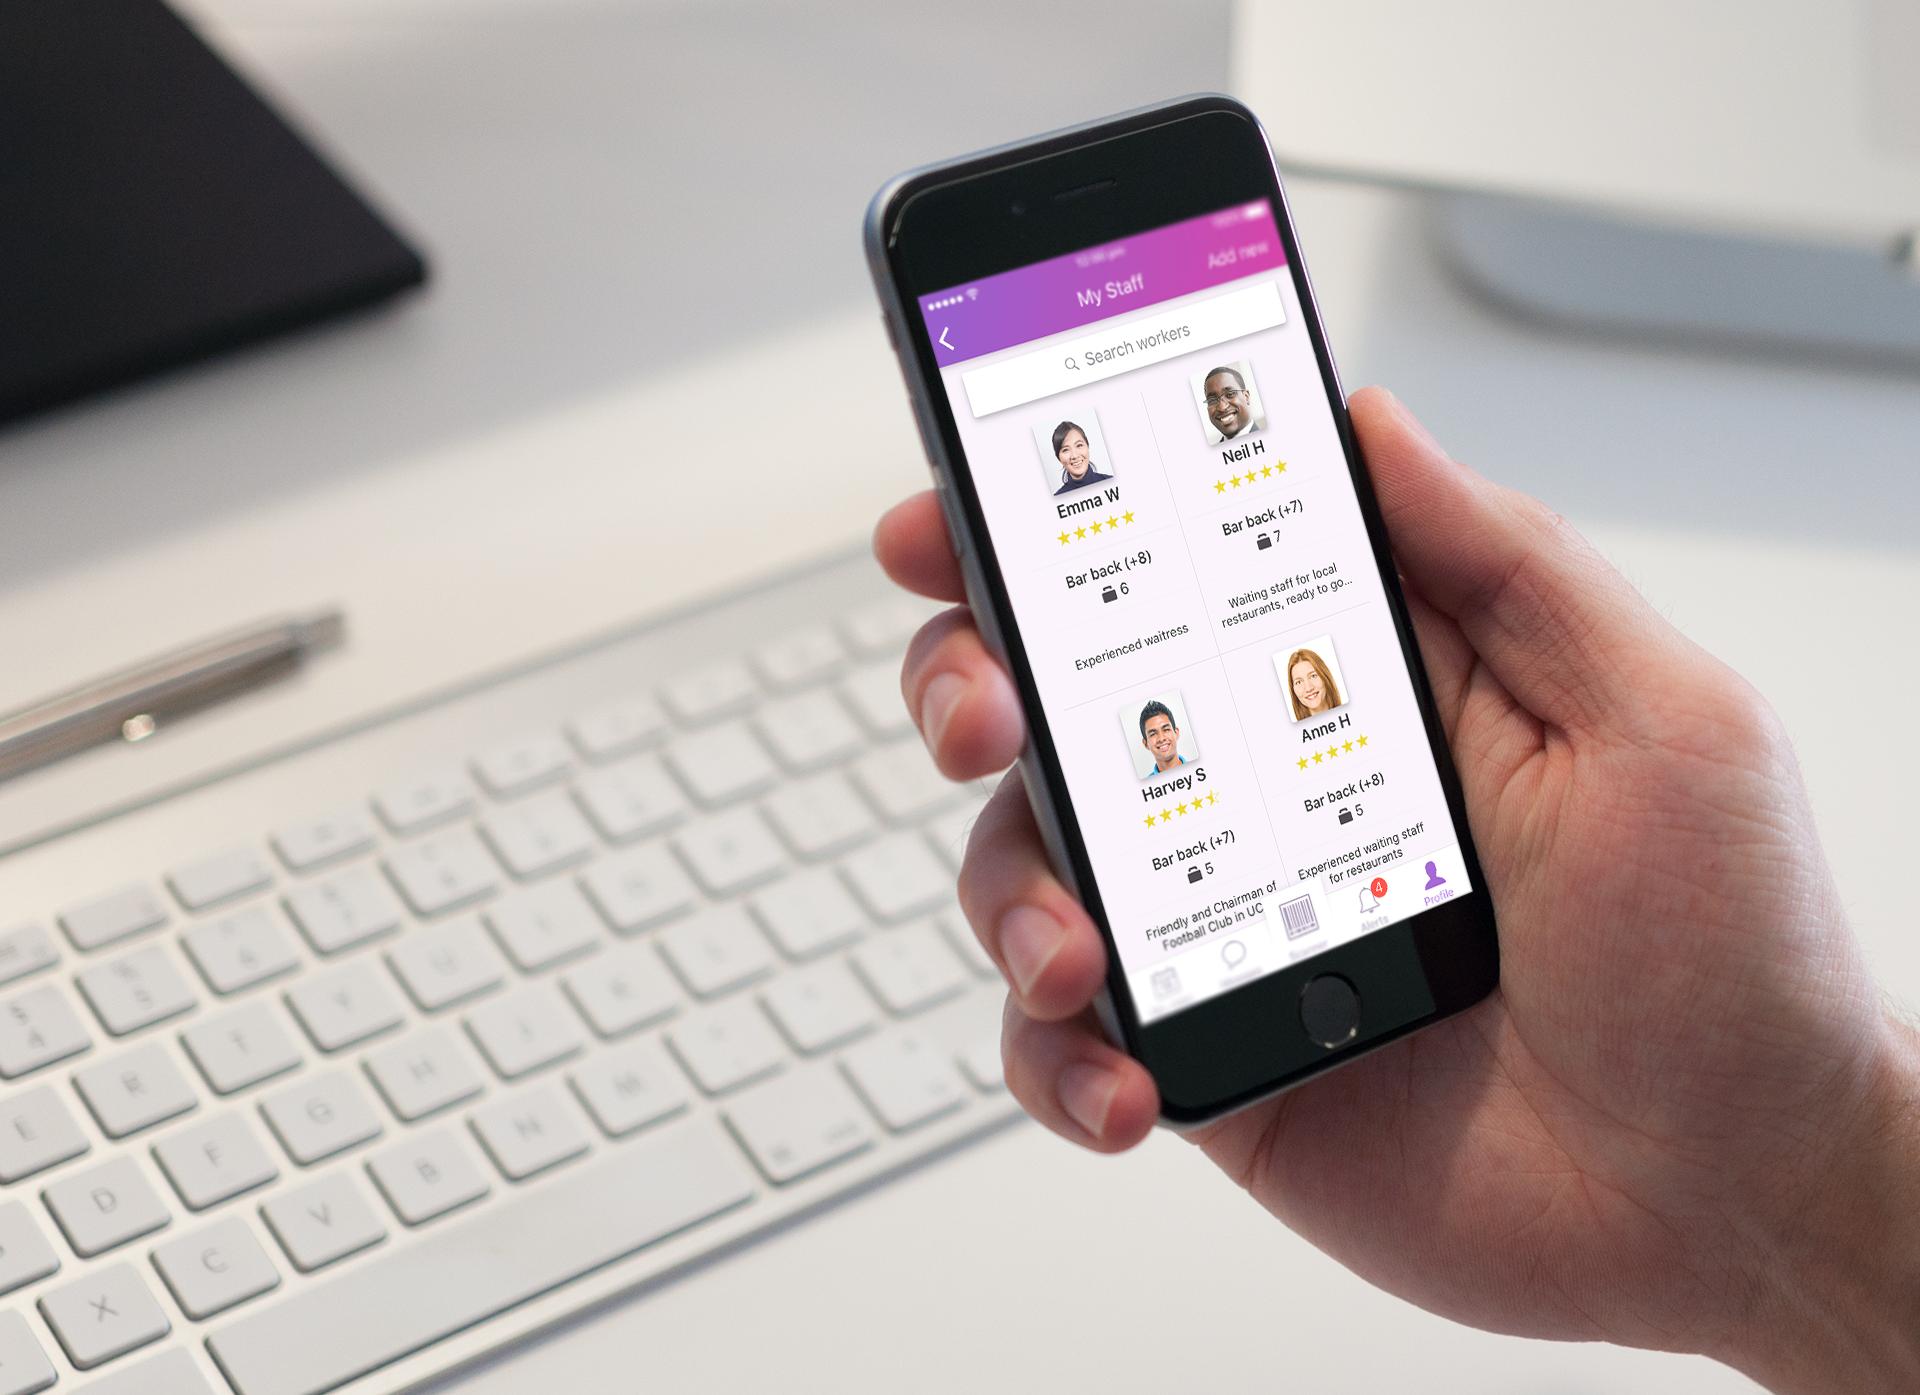 Temporary work, employment, recruitment, Syft, recruitment apps